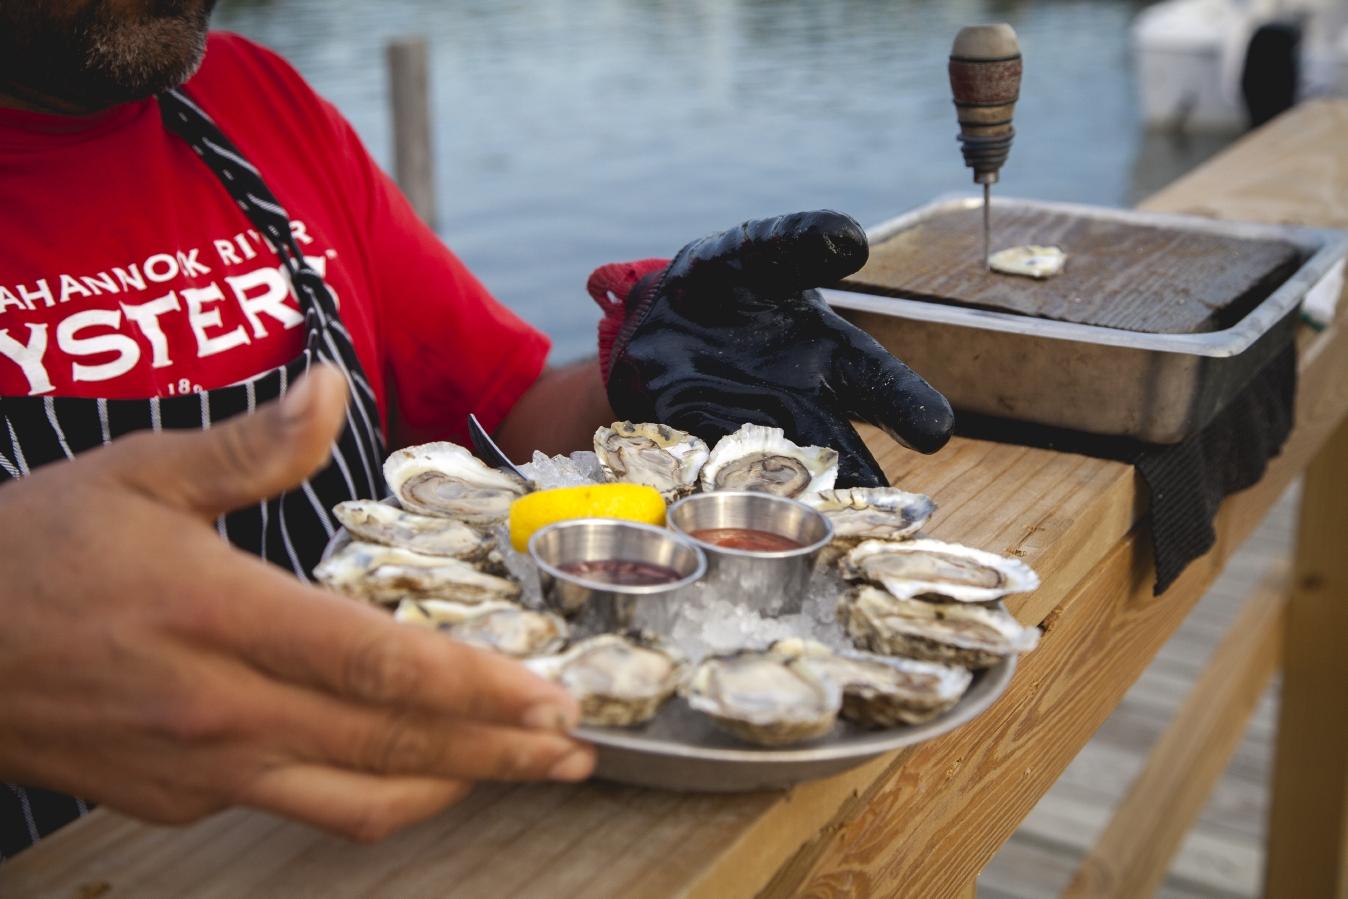 Rappahannock River Oyster